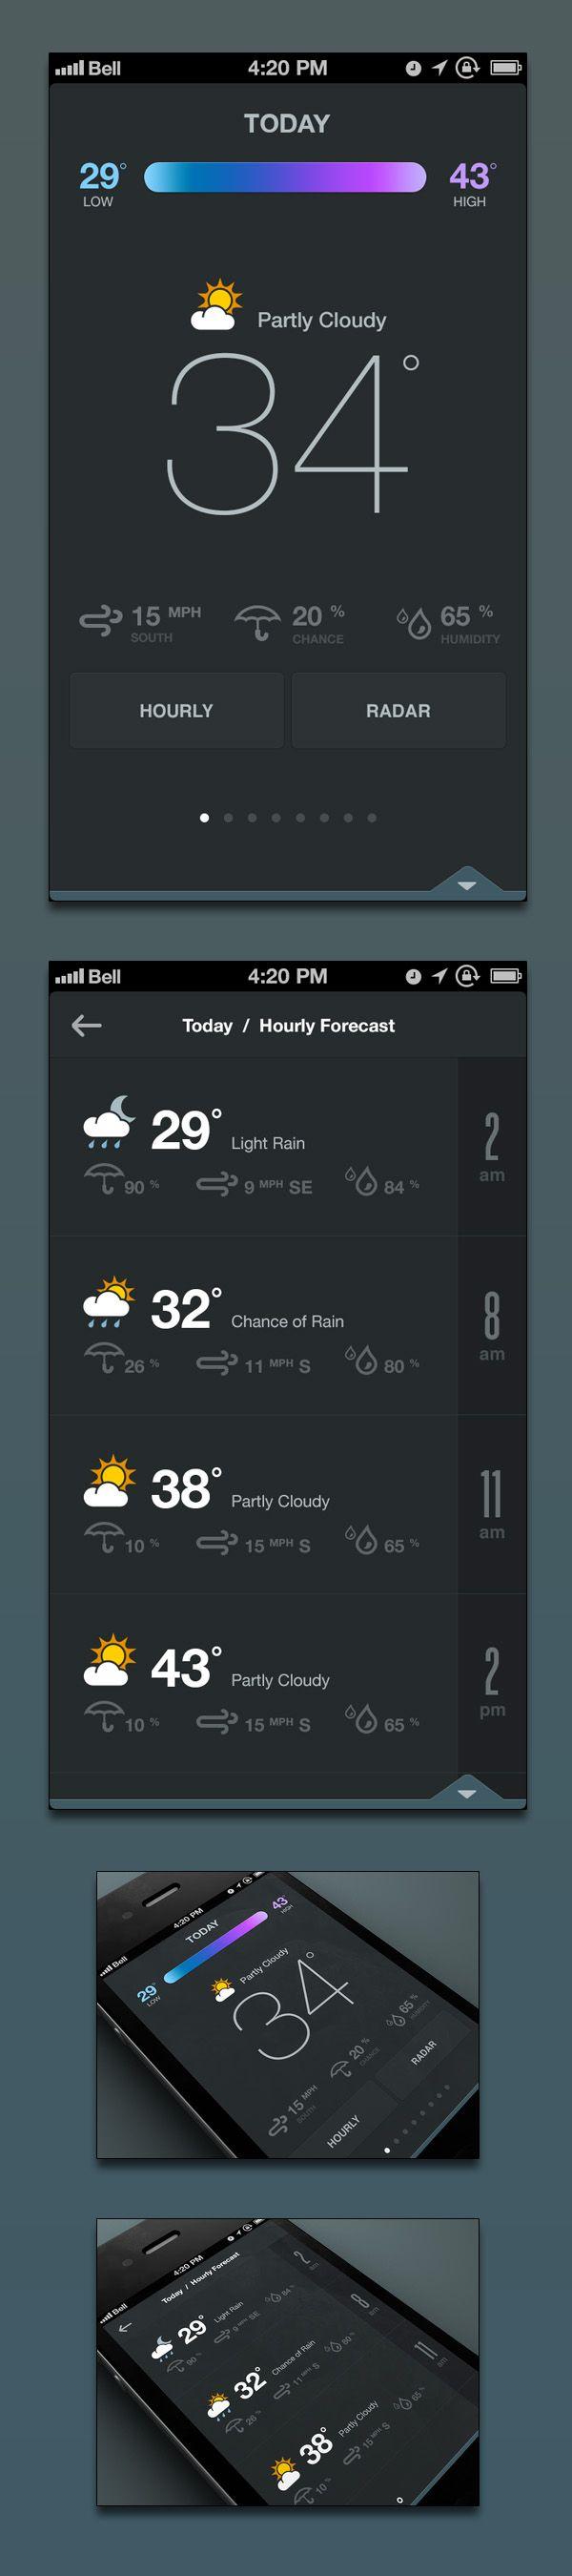 Weather app concept by Ben Cline